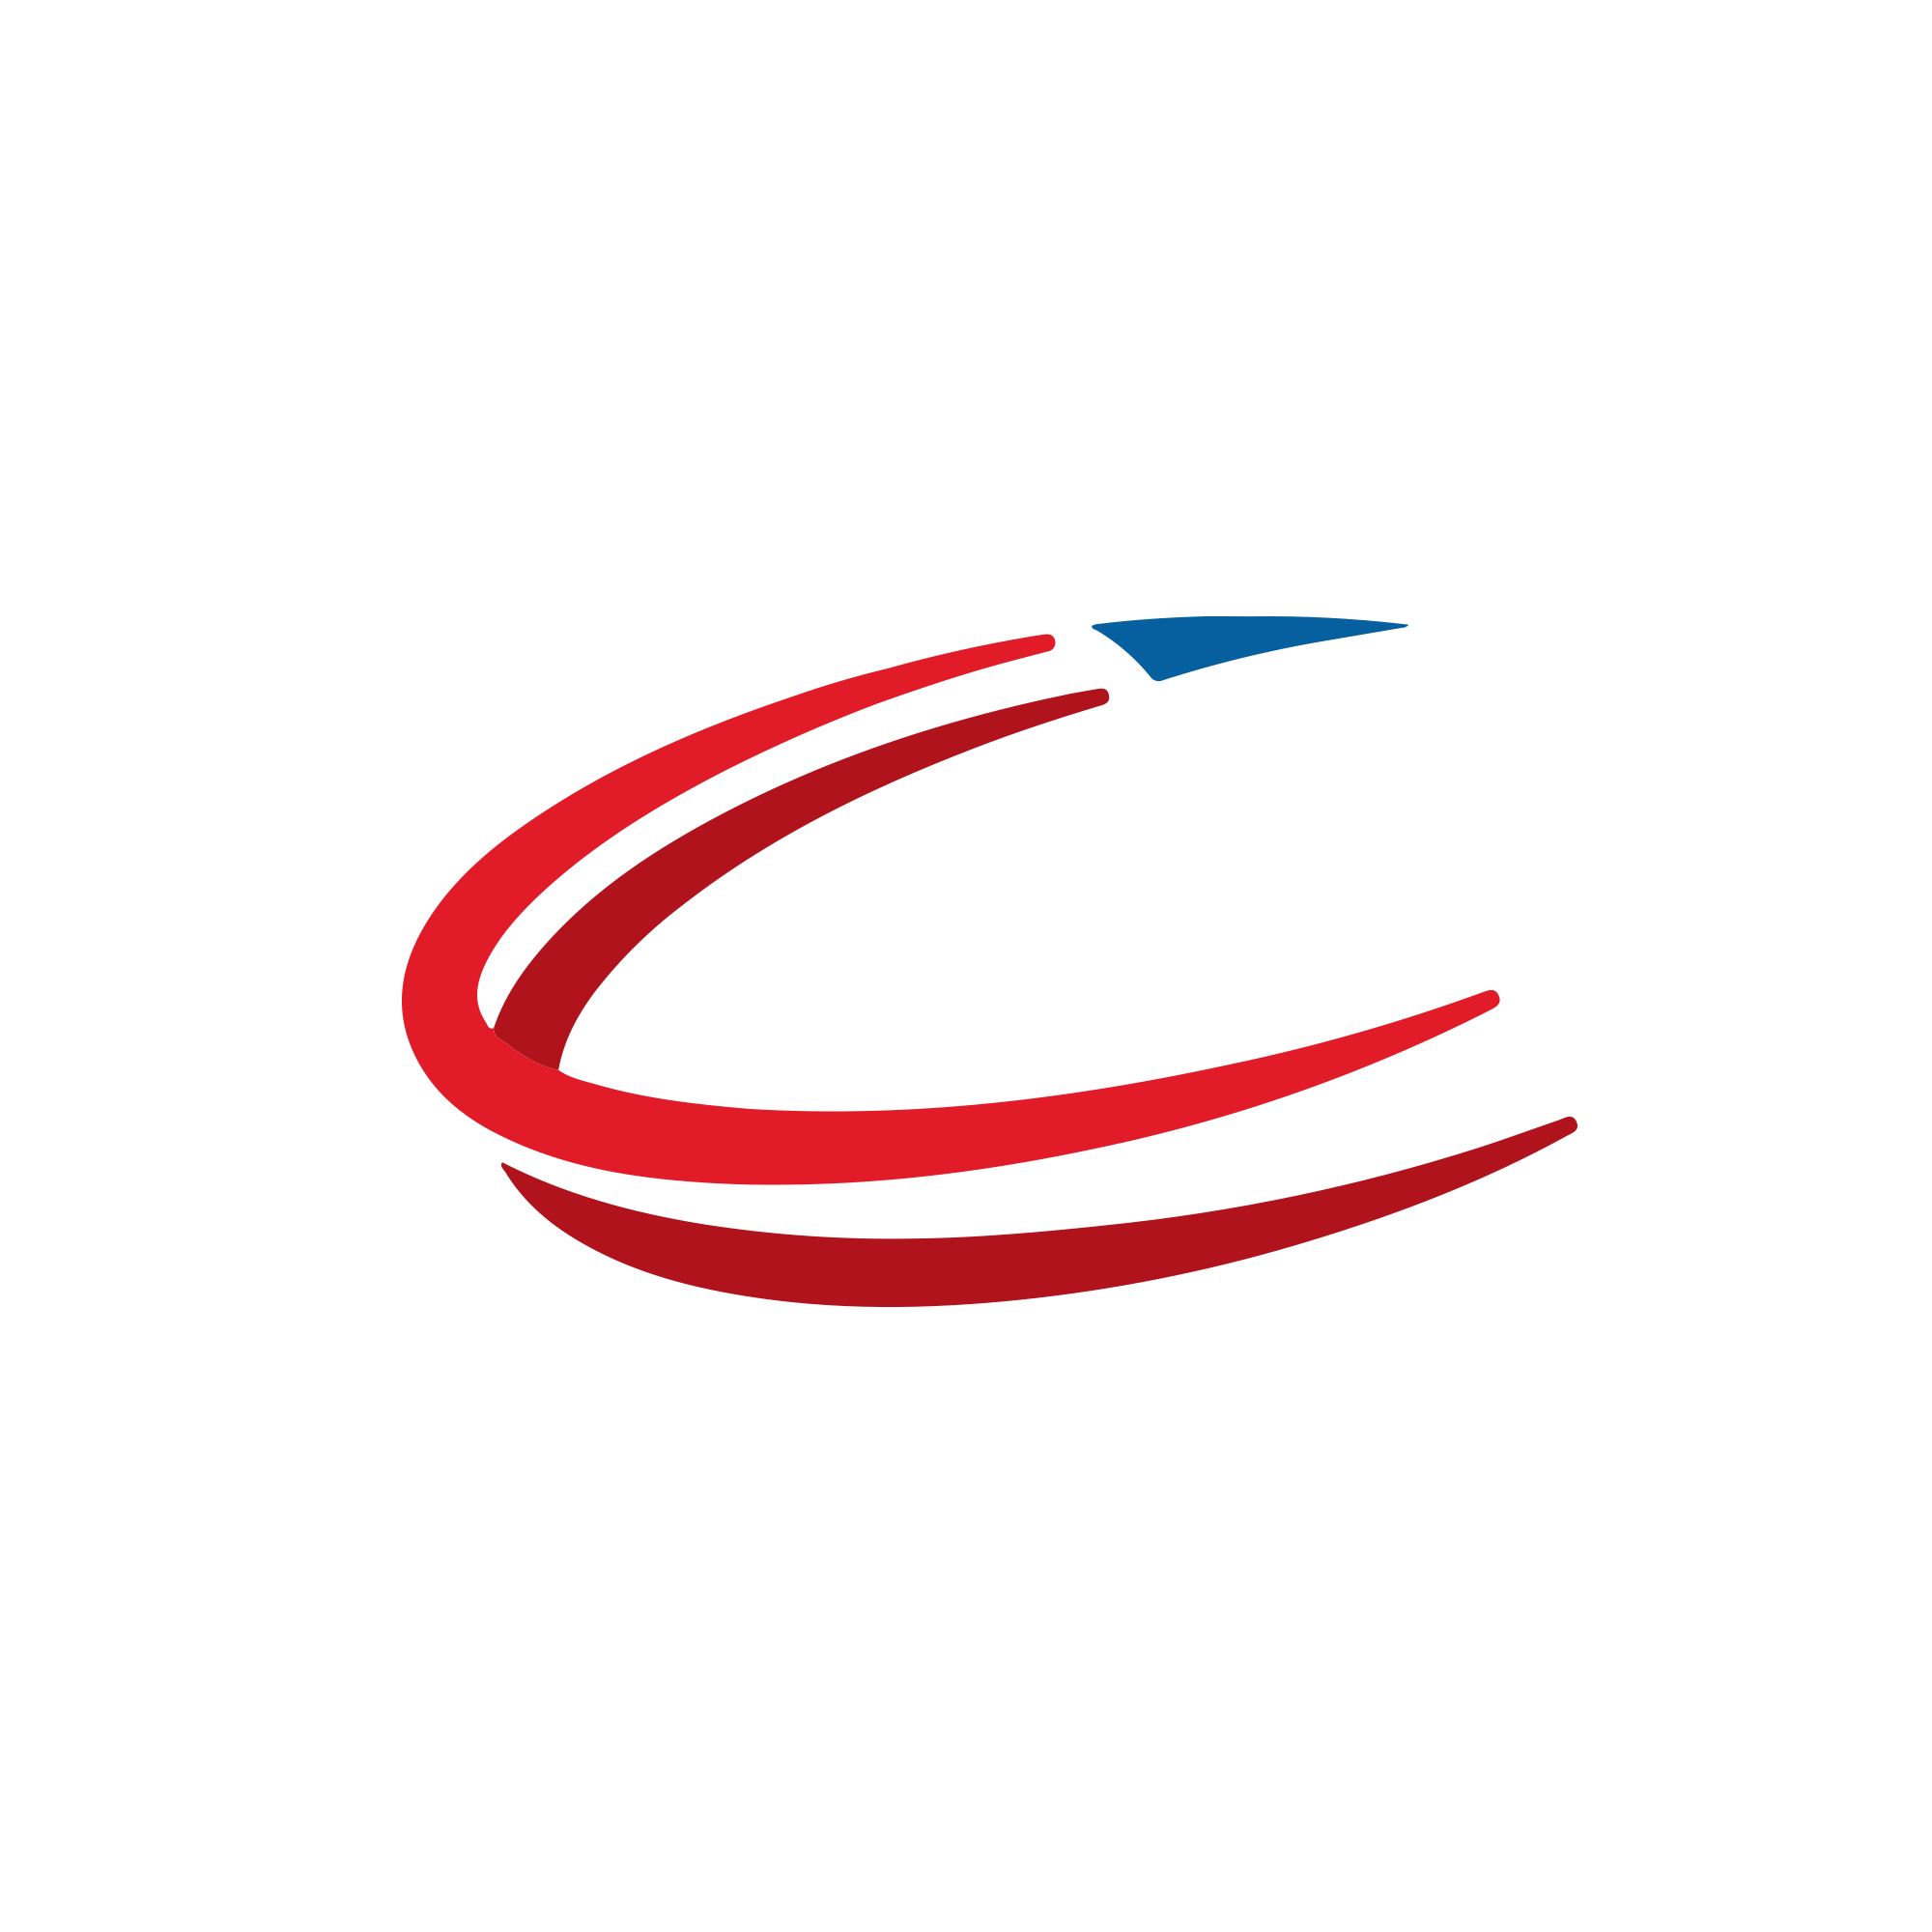 Pin On Lettermark Monogram Logo Icons A Z